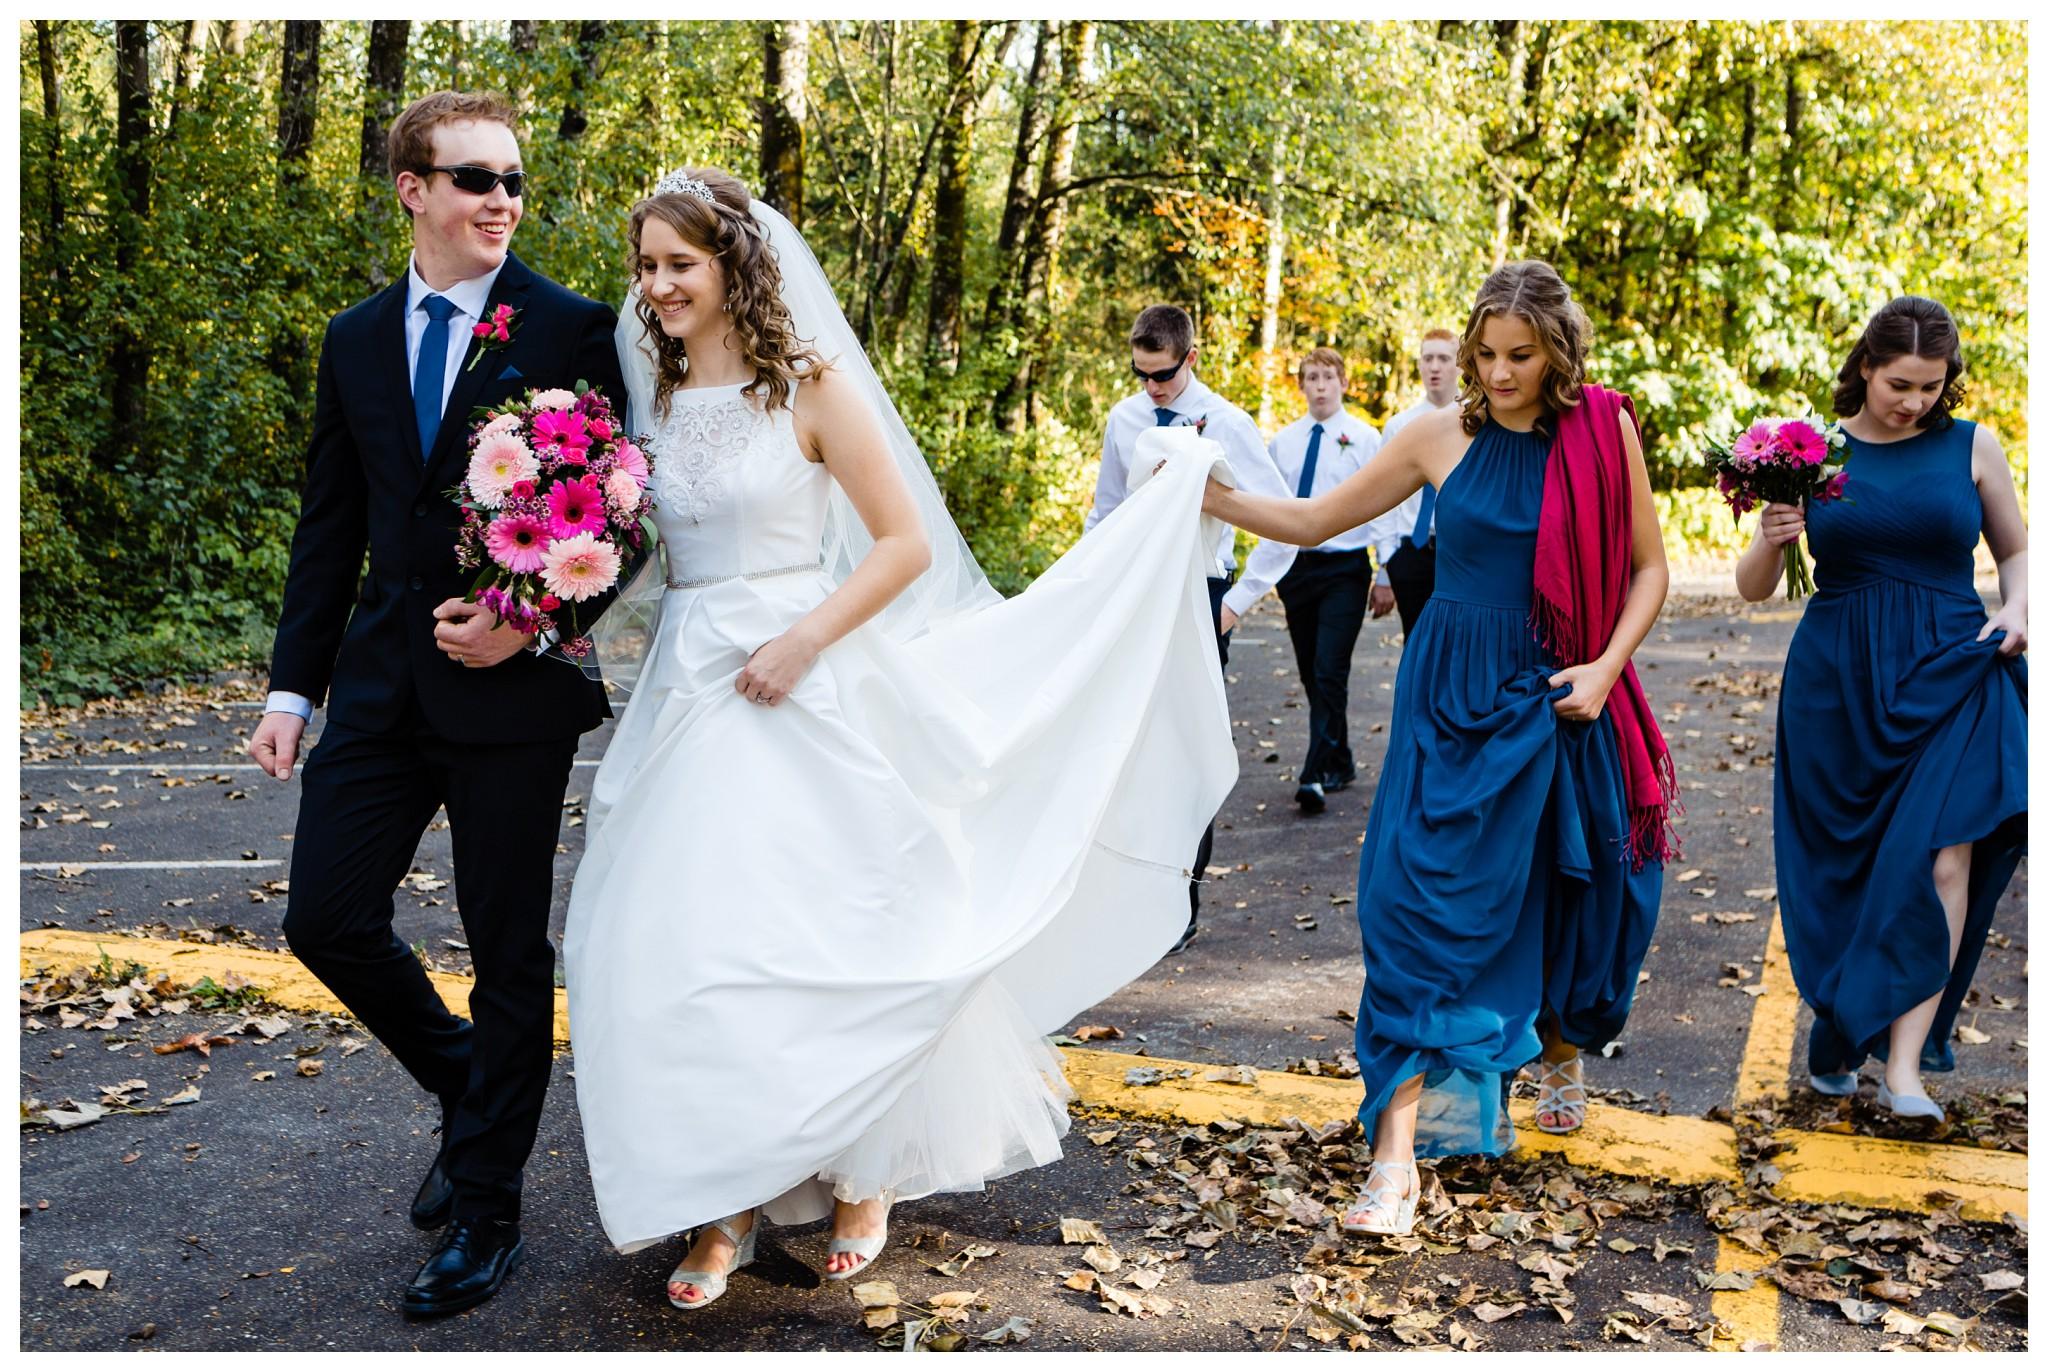 Aldergrove Park Christian Church Wedding Photography Pink Flowers Blue Bridesmaid Dress Fall_0099.jpg